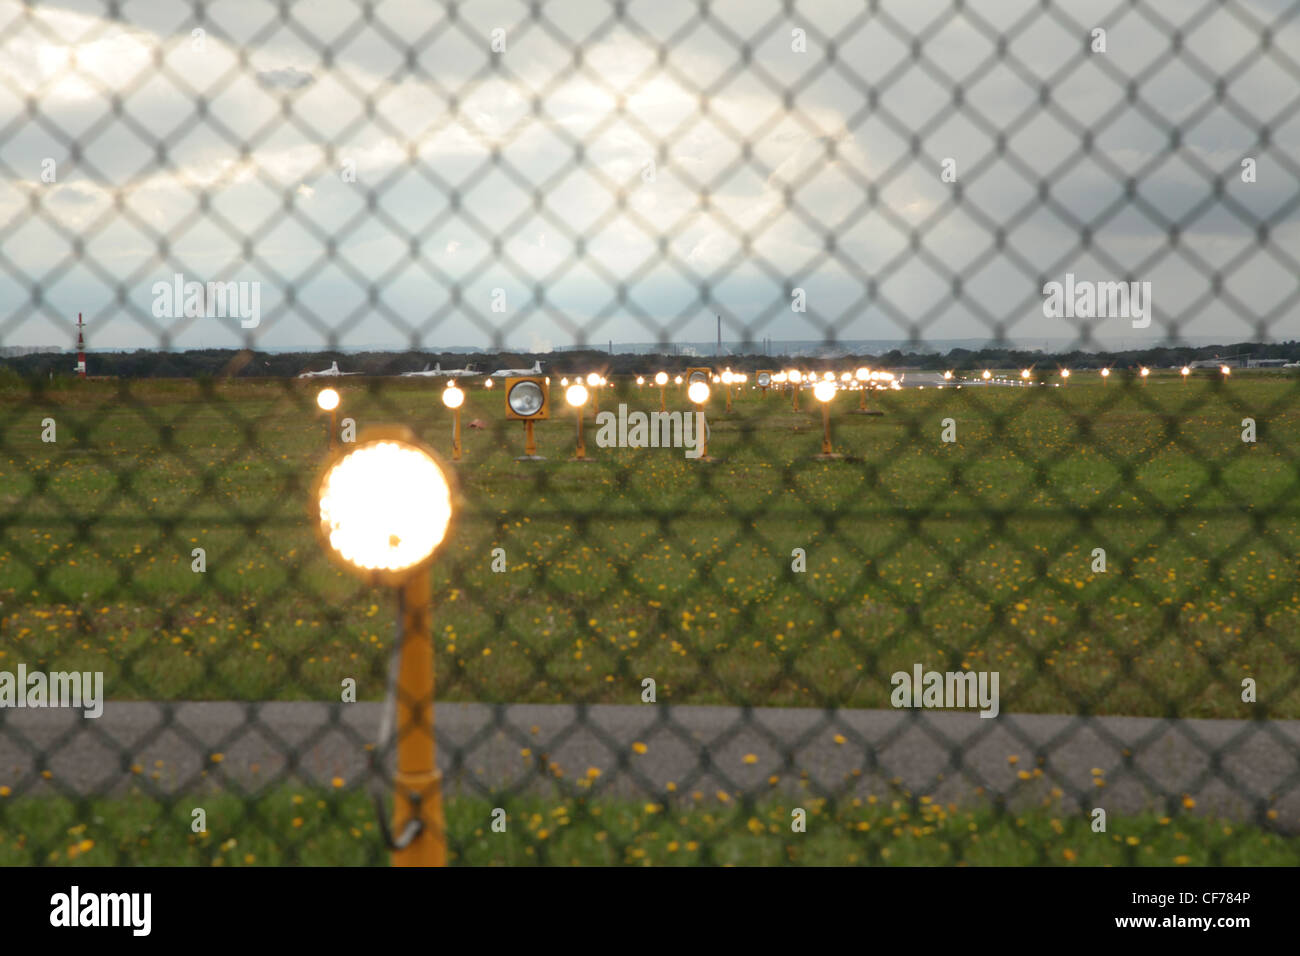 Landebahn am Flughafen mit Befeuerung, Airport Lighting, Airport Beacons - Stock Image